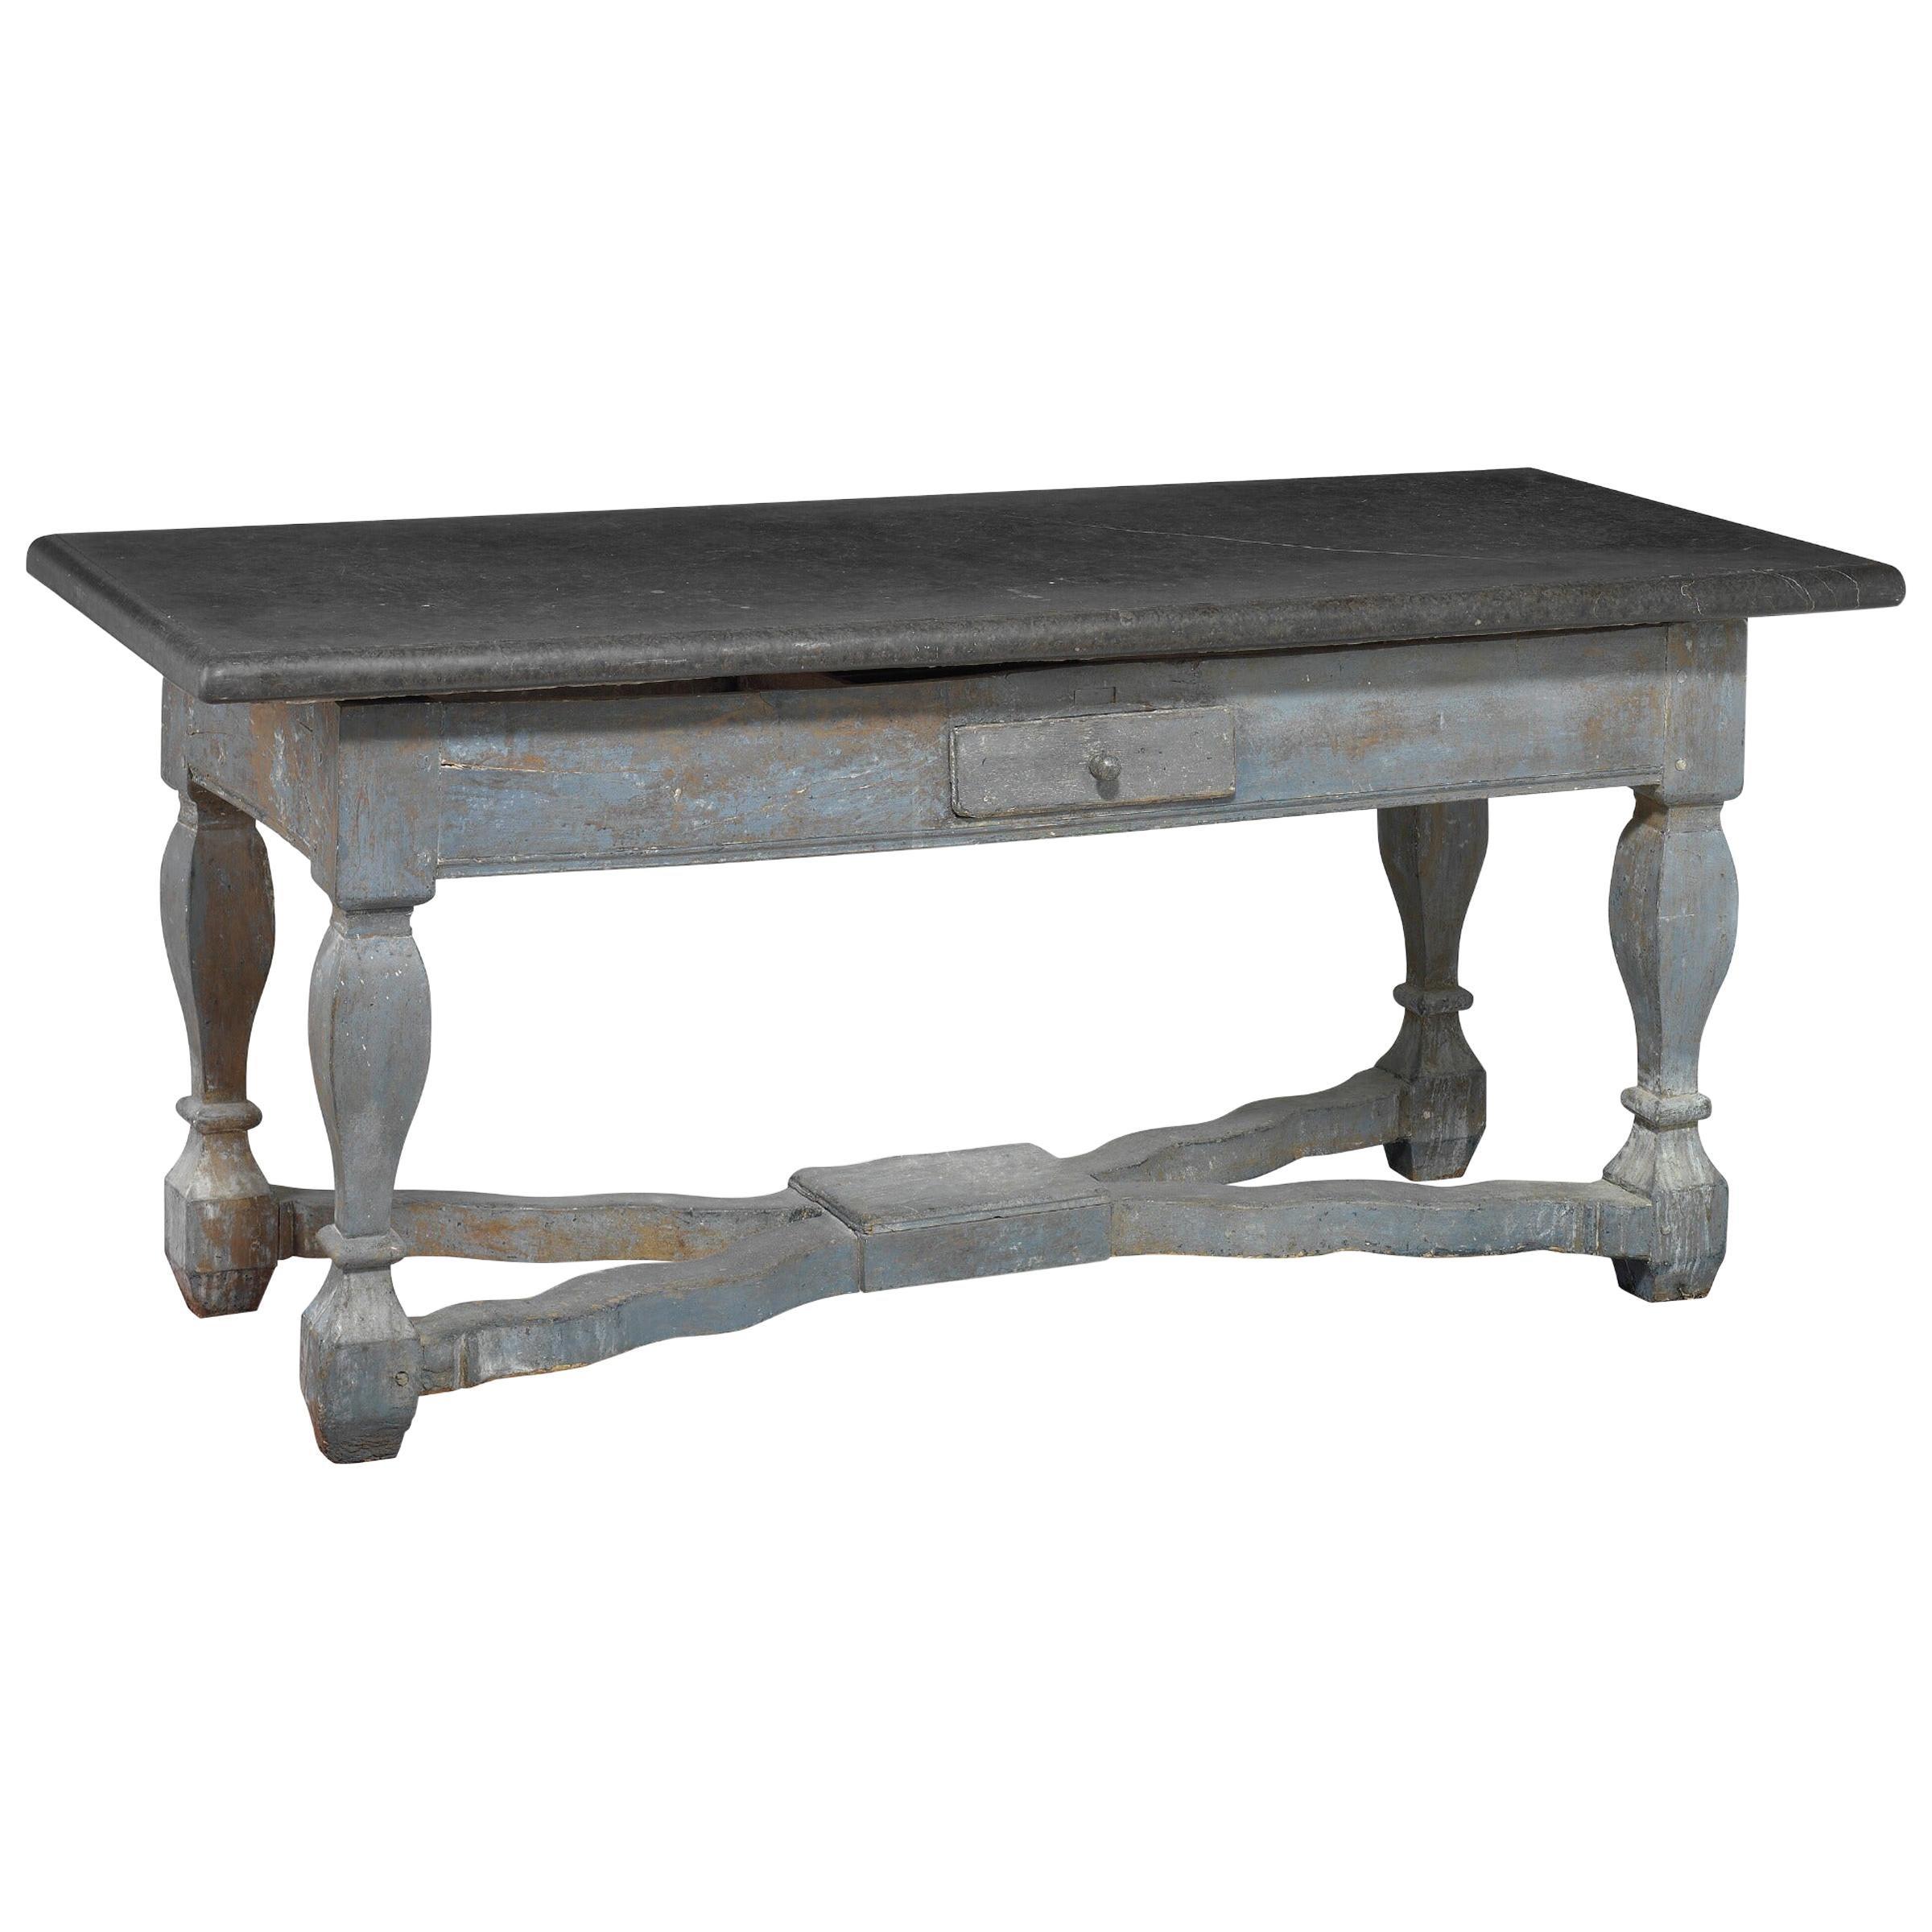 Baroque Stone Top Table, Sweden, 18th Century